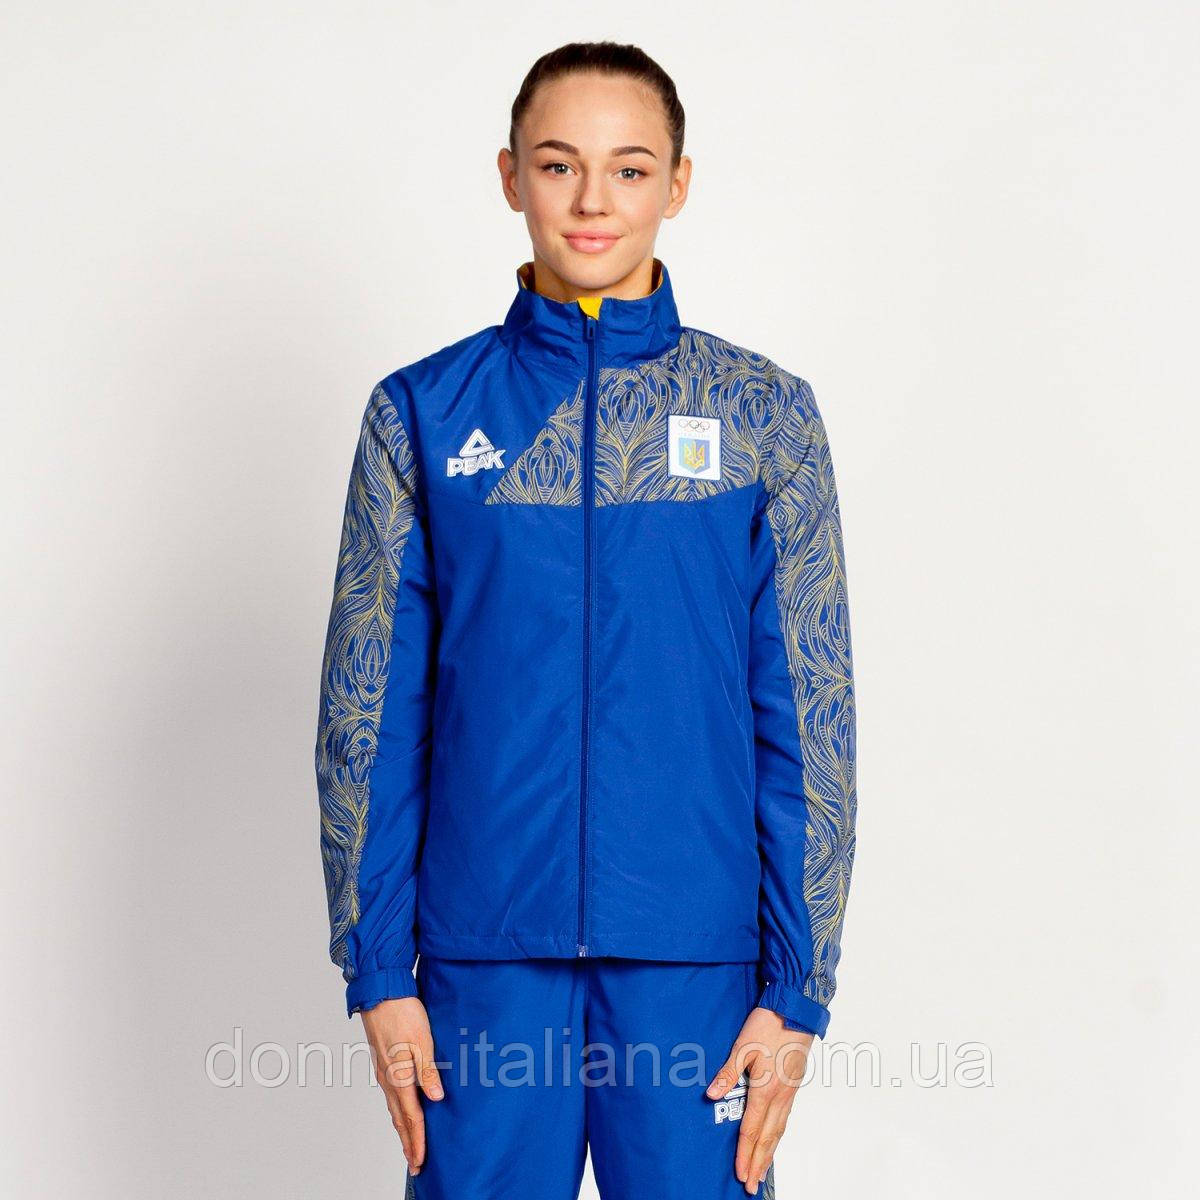 Спортивная кофта Peak Sport FS-UW1809NOK-T-BLU L Синяя (2000130259017)